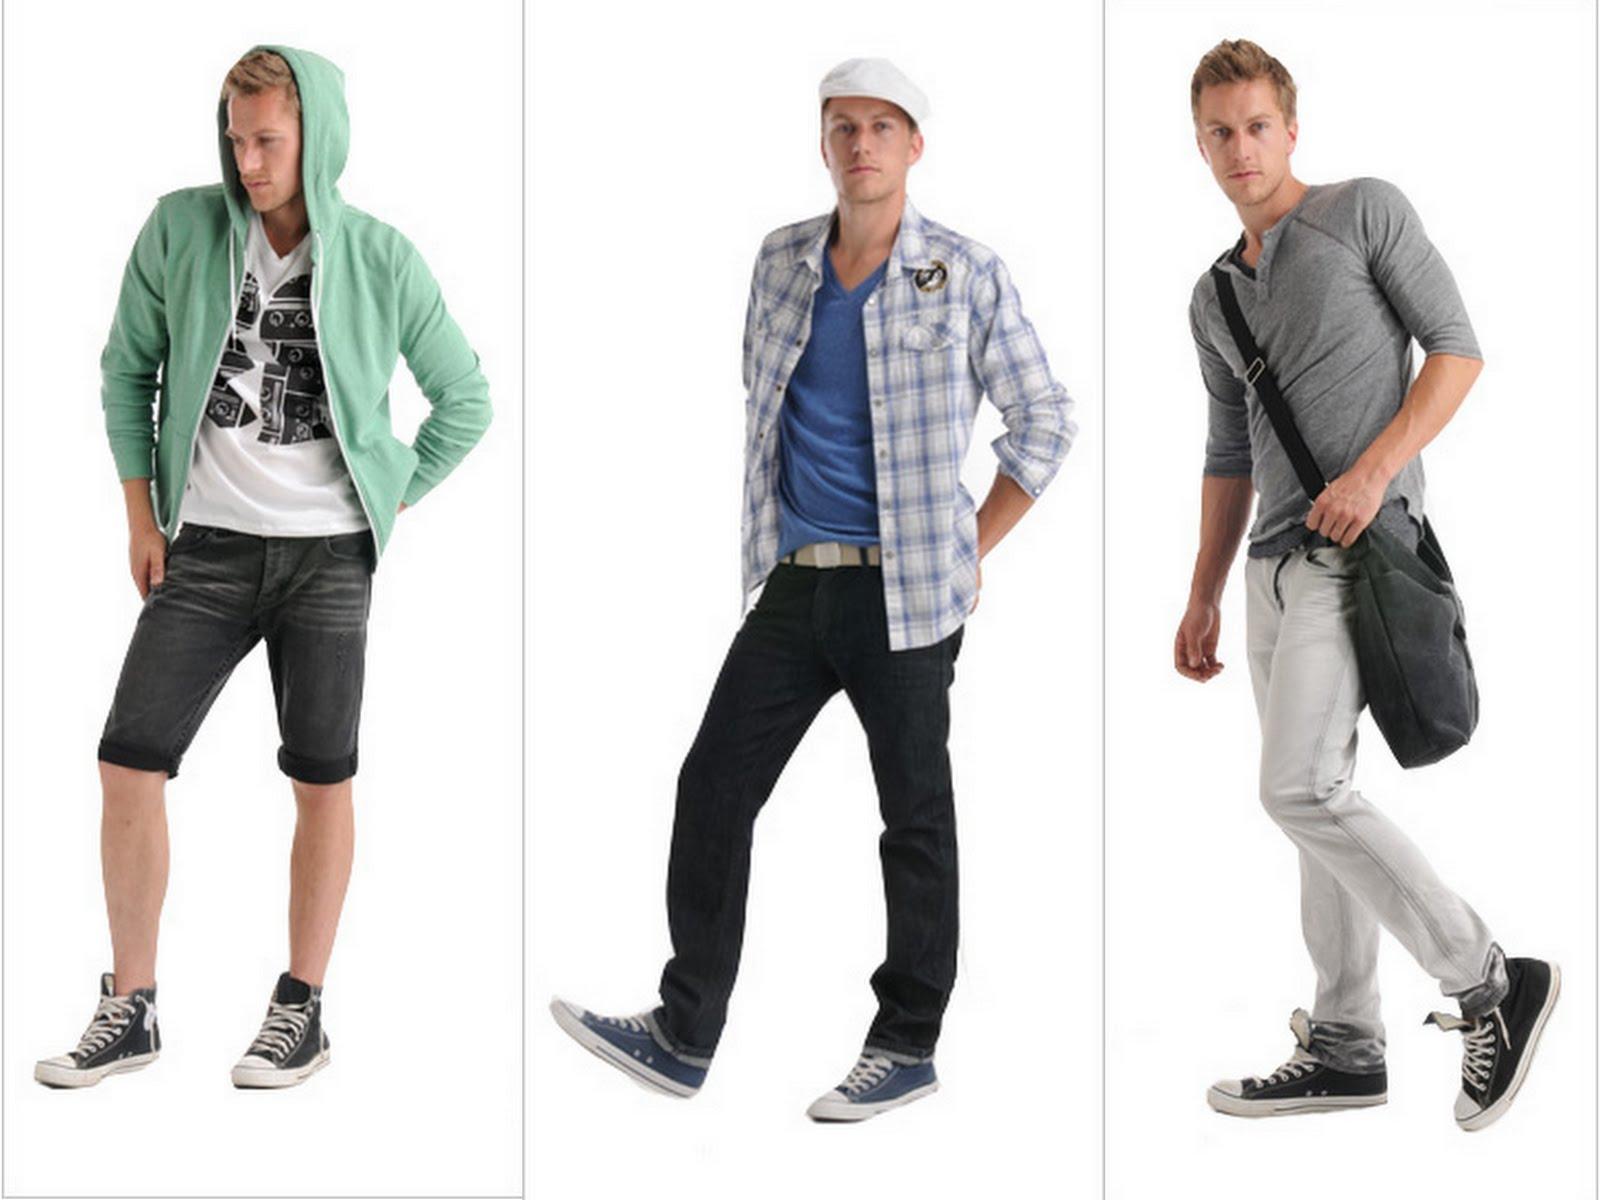 fashionable clothes fashionable clothes 2011-18